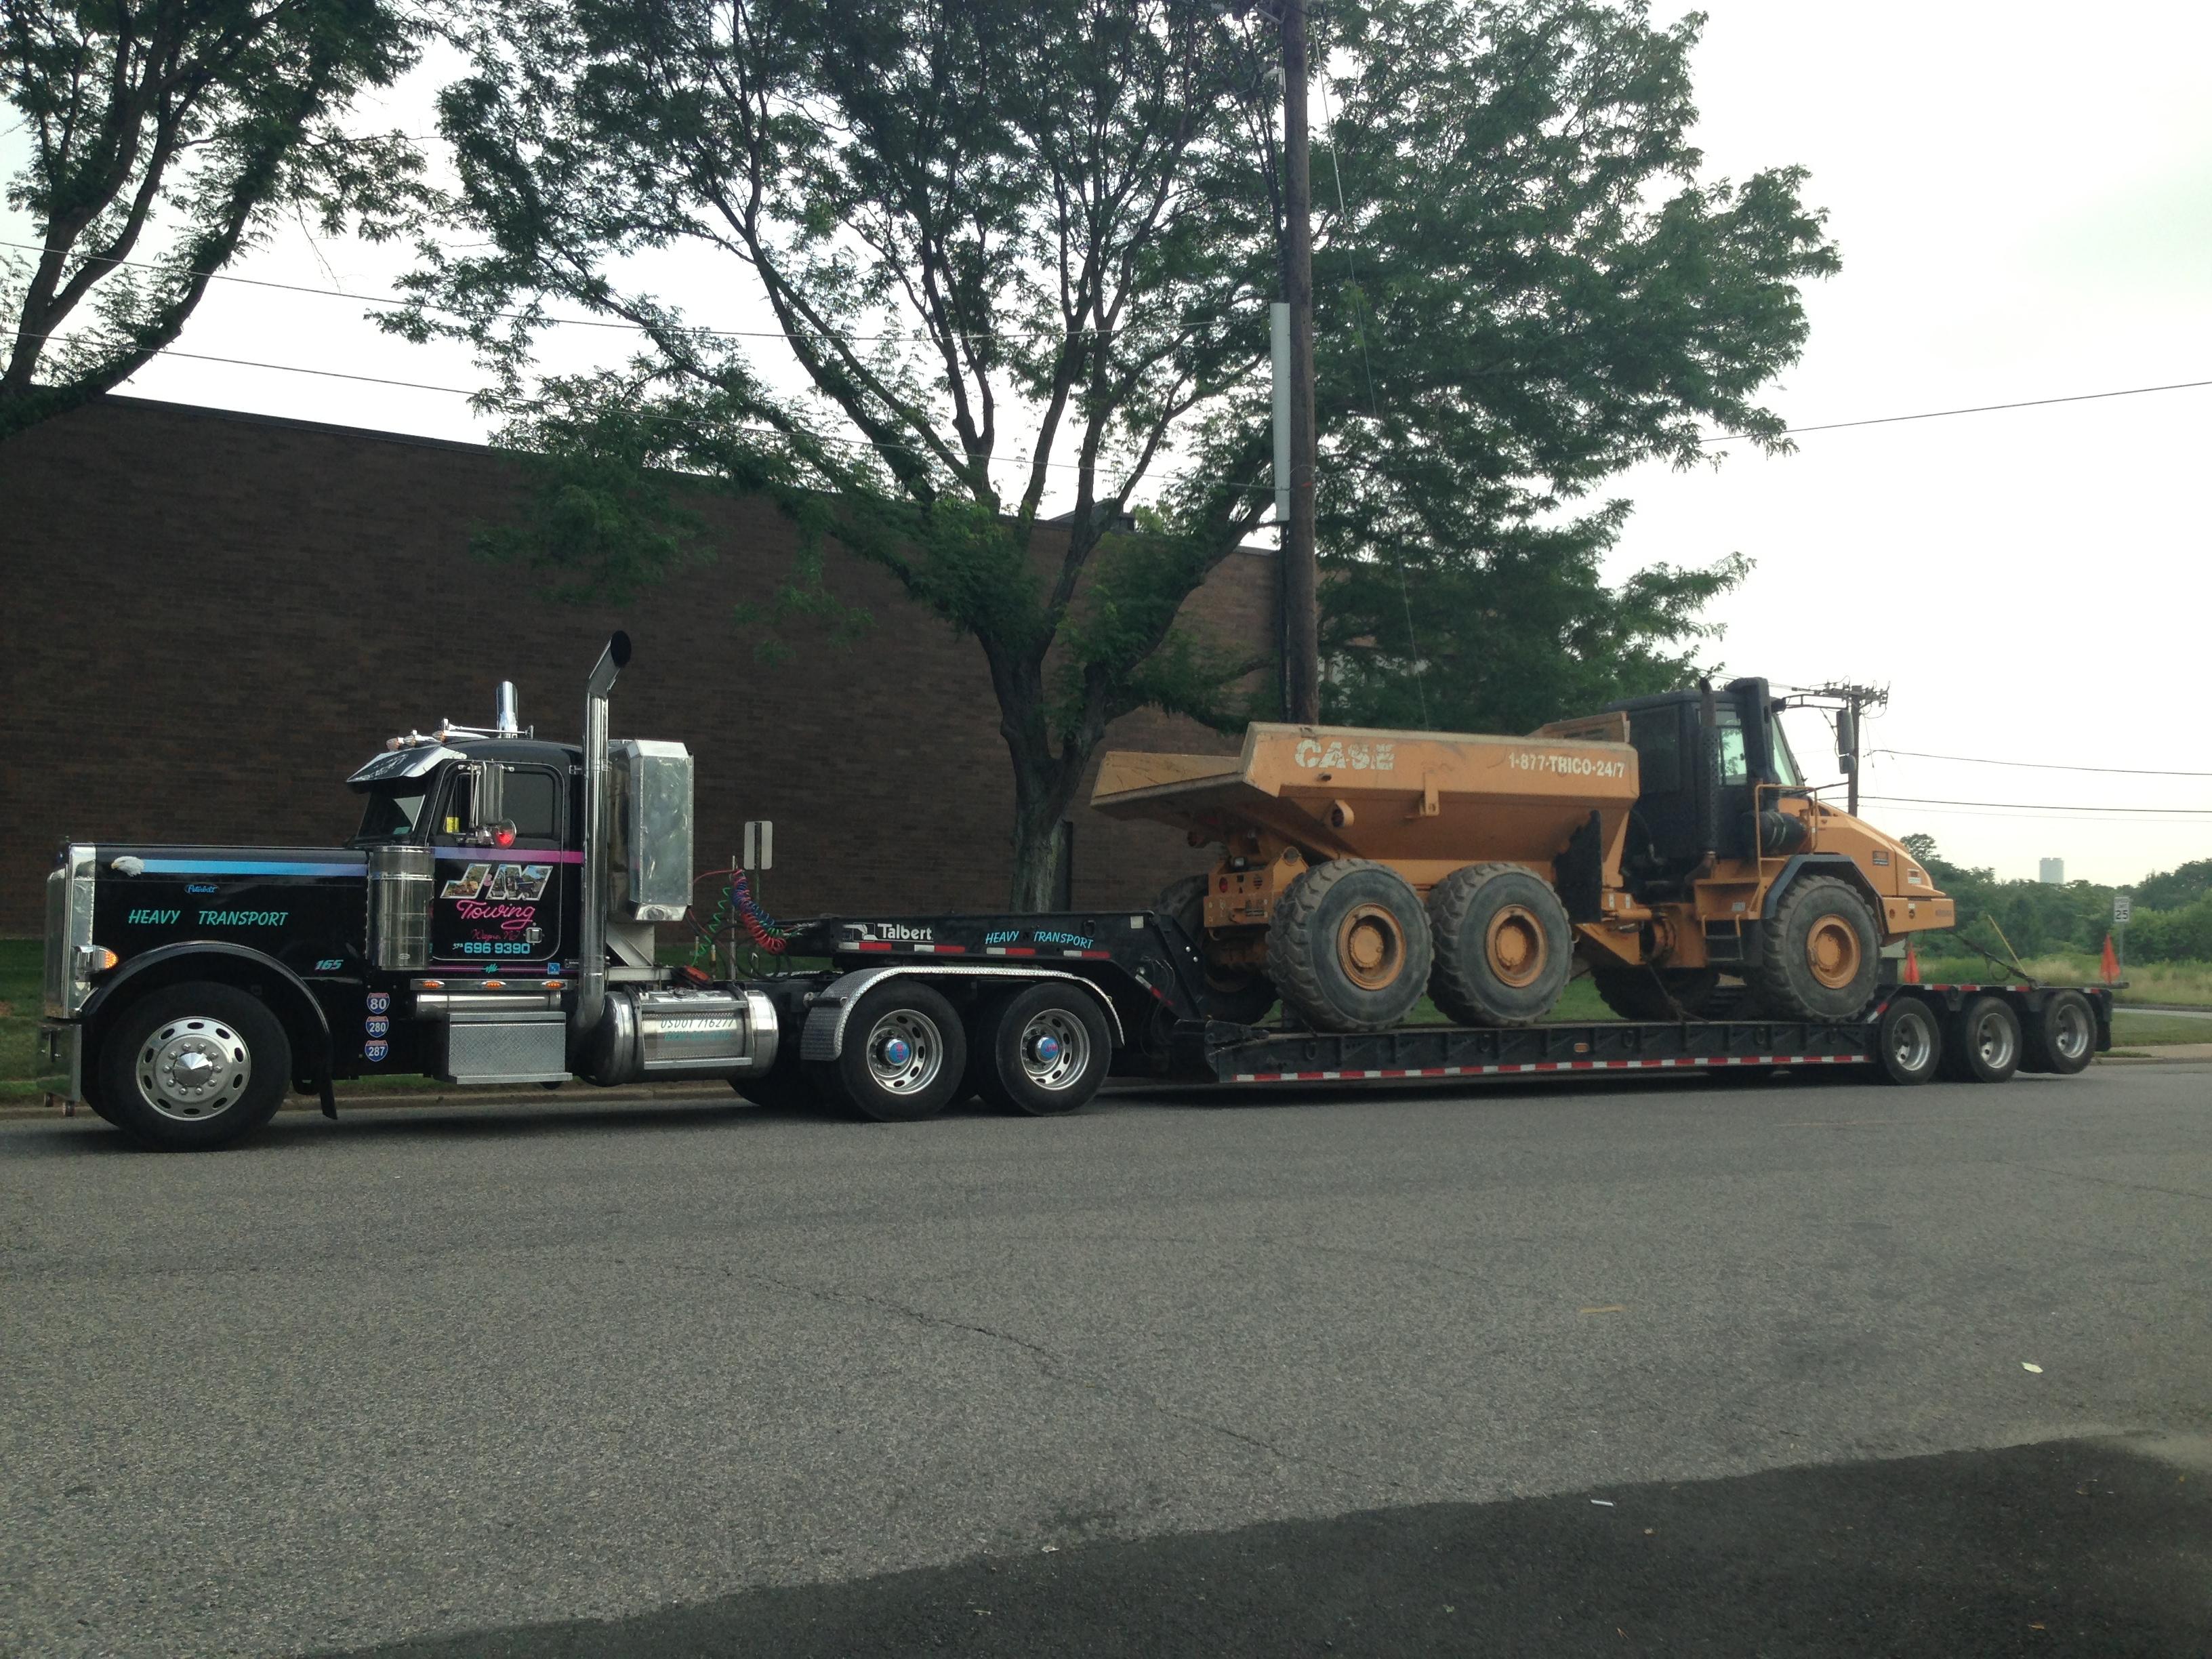 Discount Tire Hours Sunday >> J&M Towing, Wayne New Jersey (NJ) - LocalDatabase.com